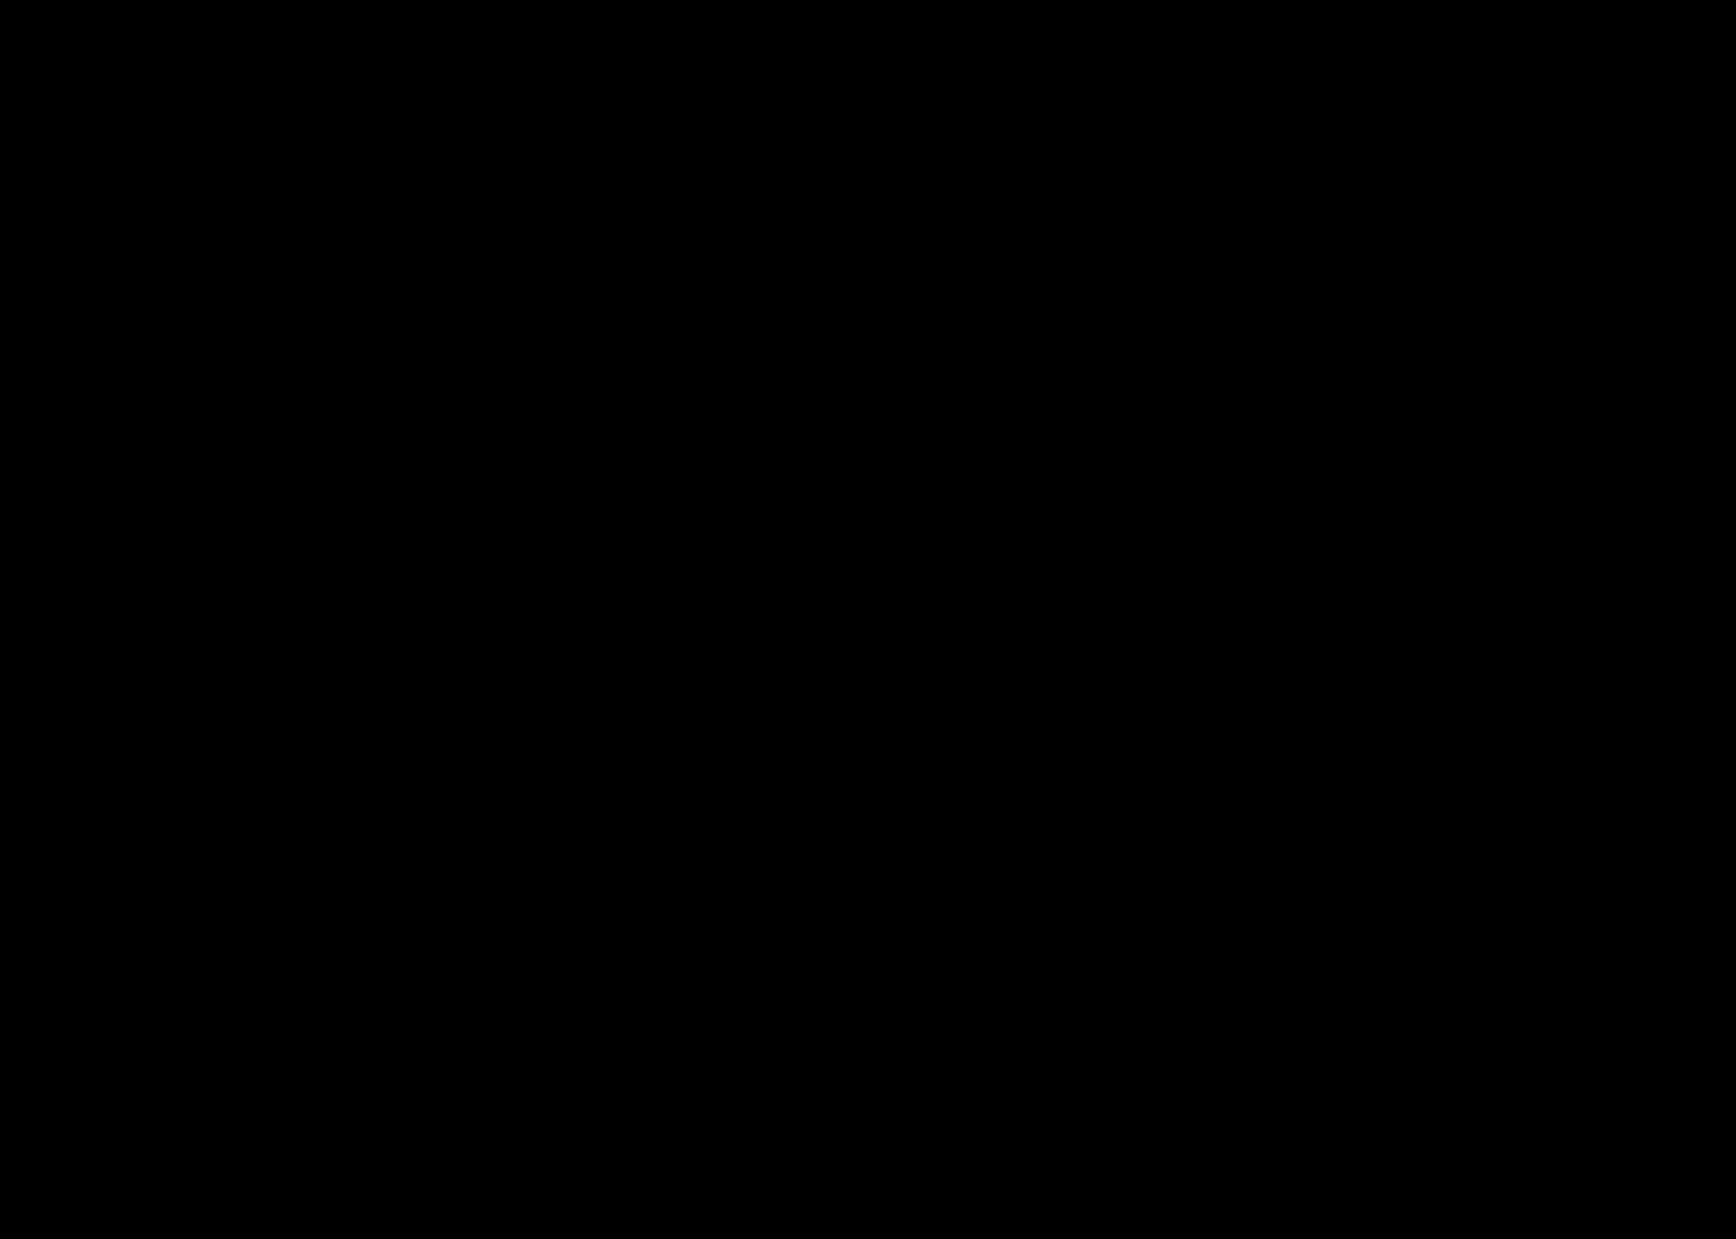 N-Formyl-L-leucine (3S,4S,6S)-3-Hexyltetrahydro-2-oxo-6-undecyl-2H-pyran-4-yl-d<sub>3</sub> Ester